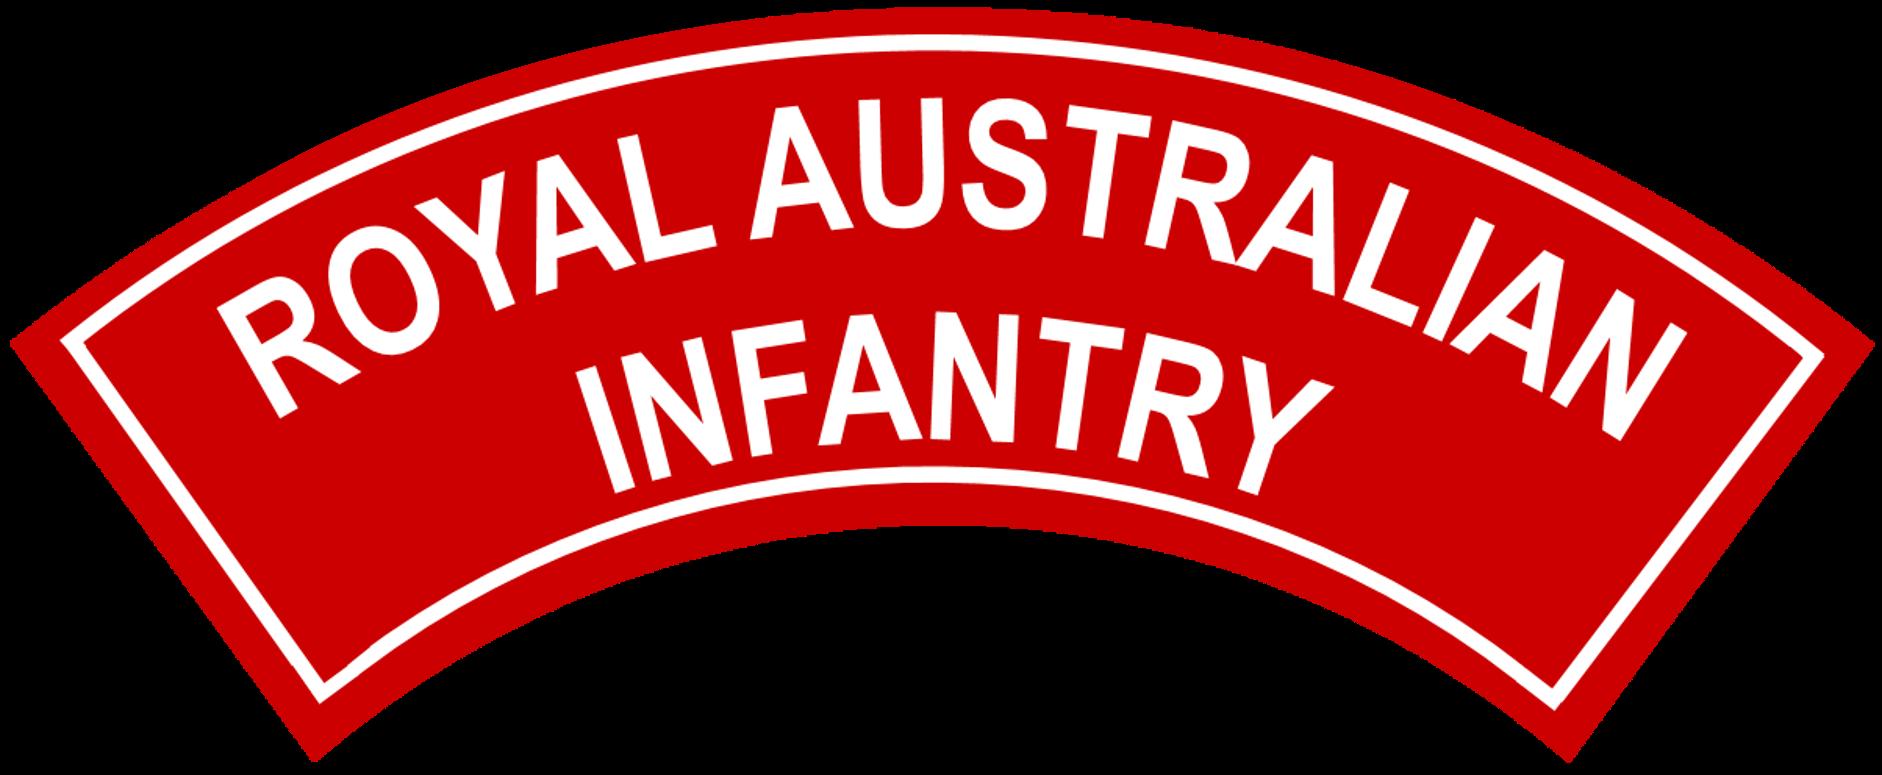 File:Royal Australian Infantry battledress flash with border.png.